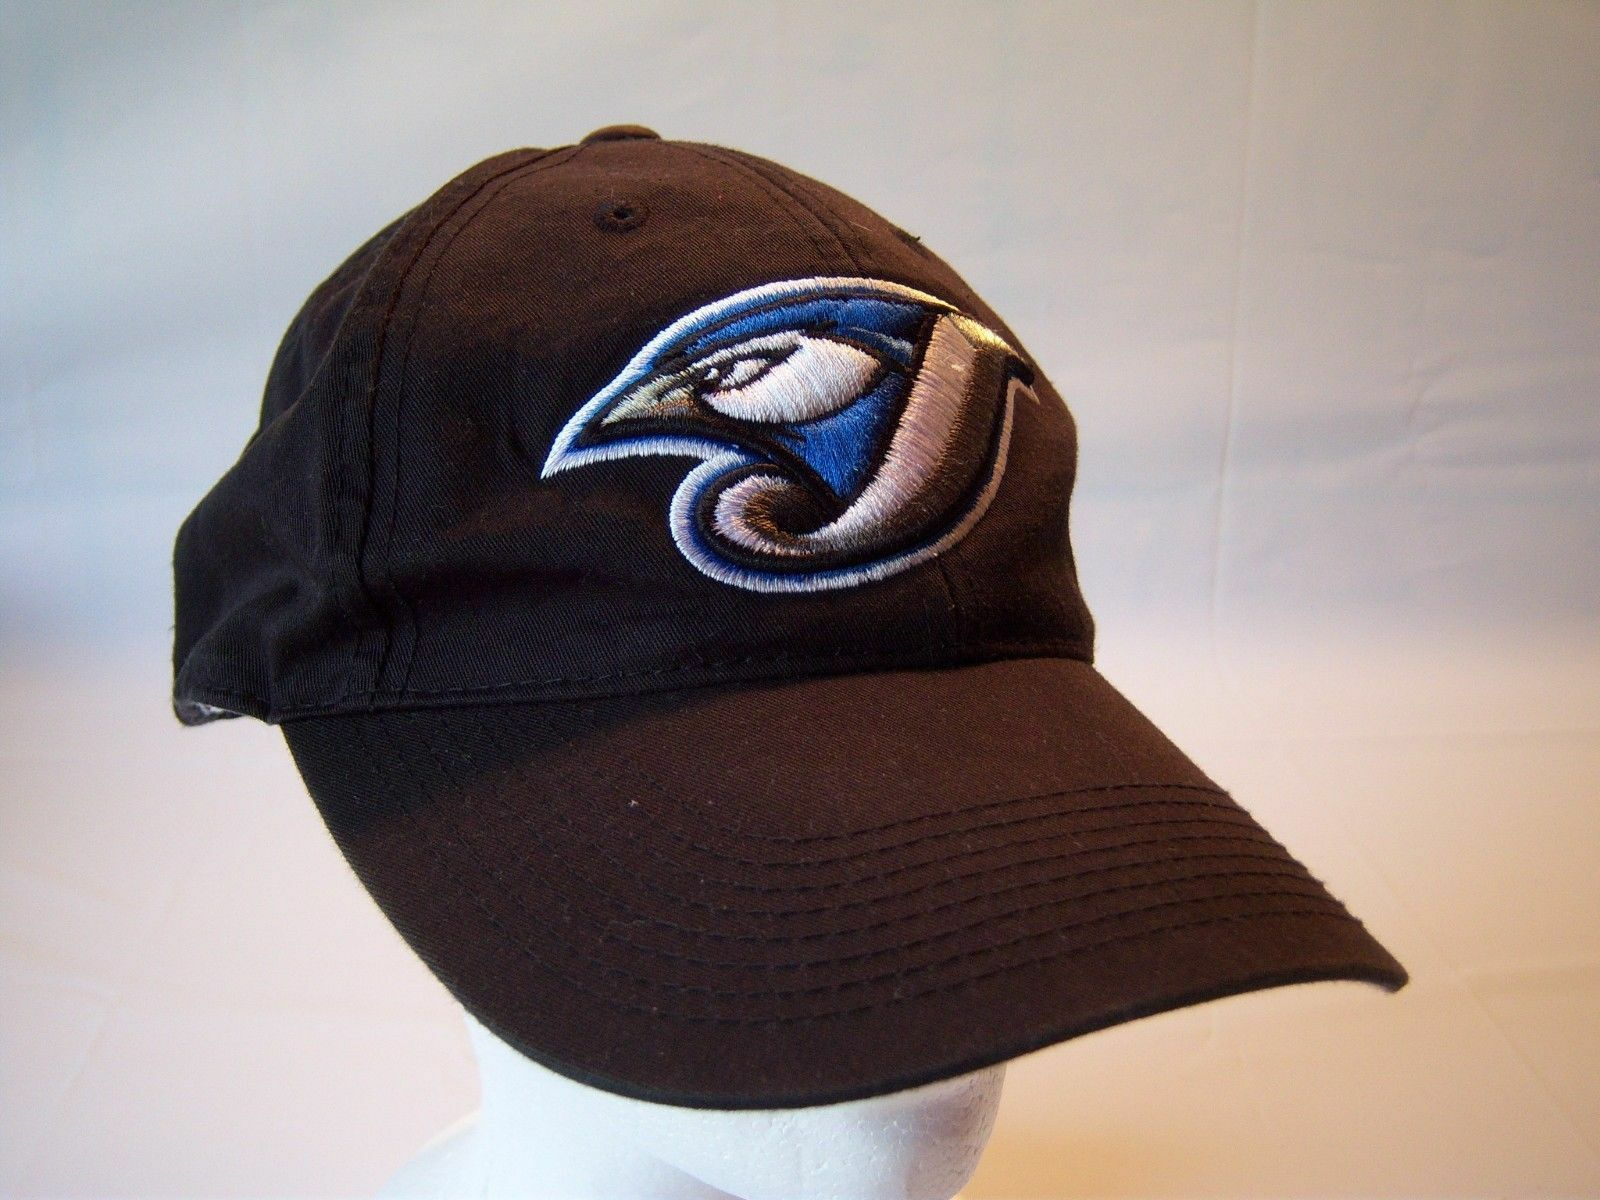 Team MLB Outdoor Caps Toronto Blue Jays Jays Jays Baseball Cap Men's One Size Fits All e6f69e